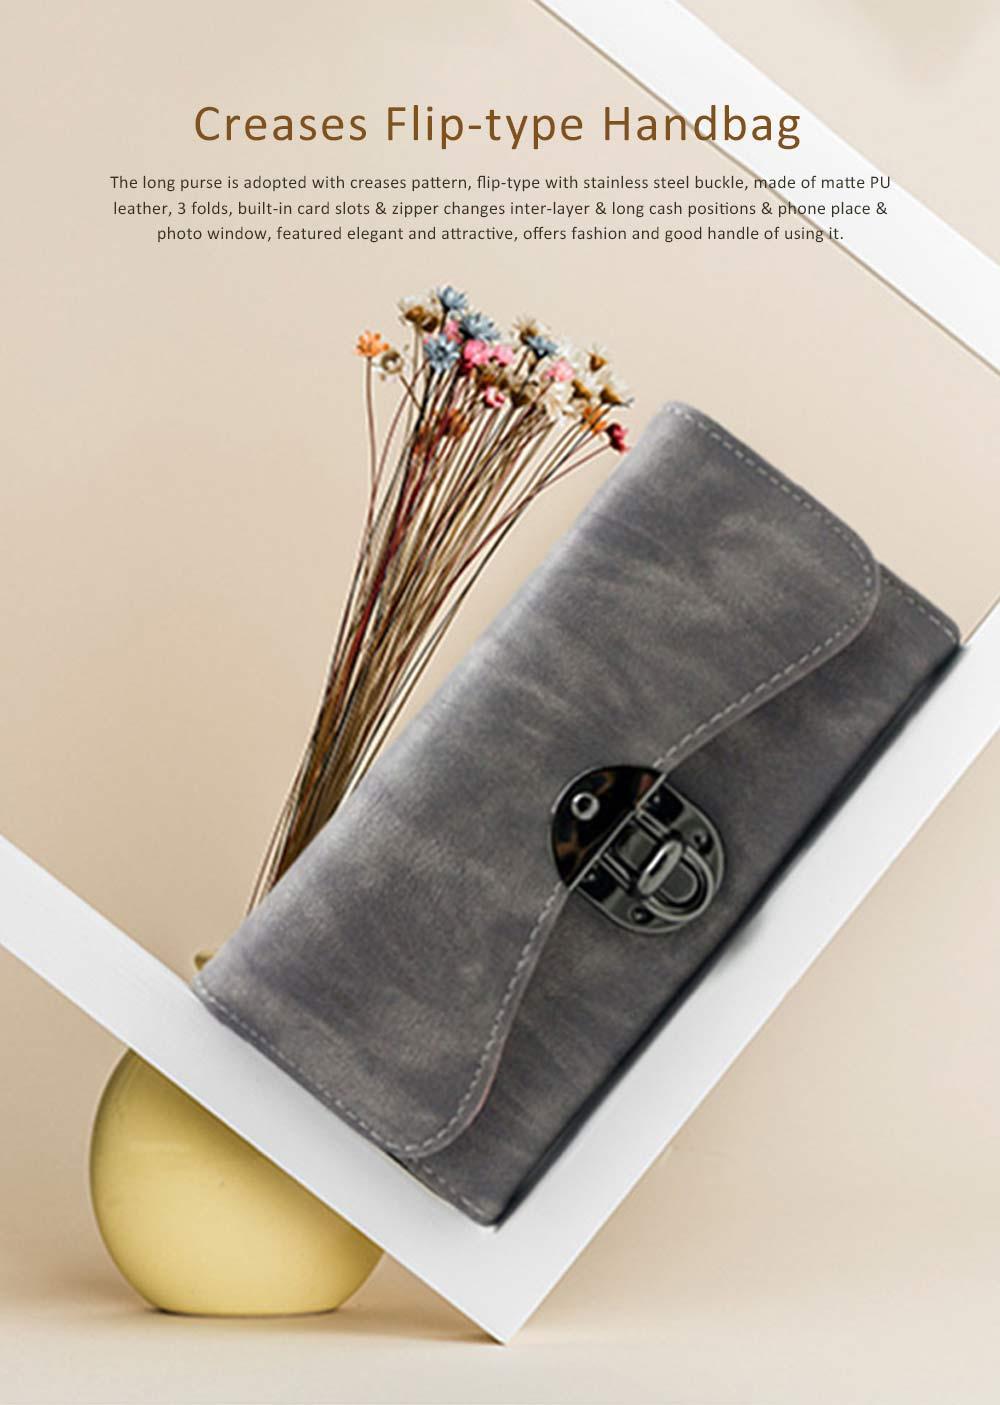 Long Clutch Women Creases Purse, Matte PU Leather Buckle Card Holder Elegant Flip-type Clutch Bag 0